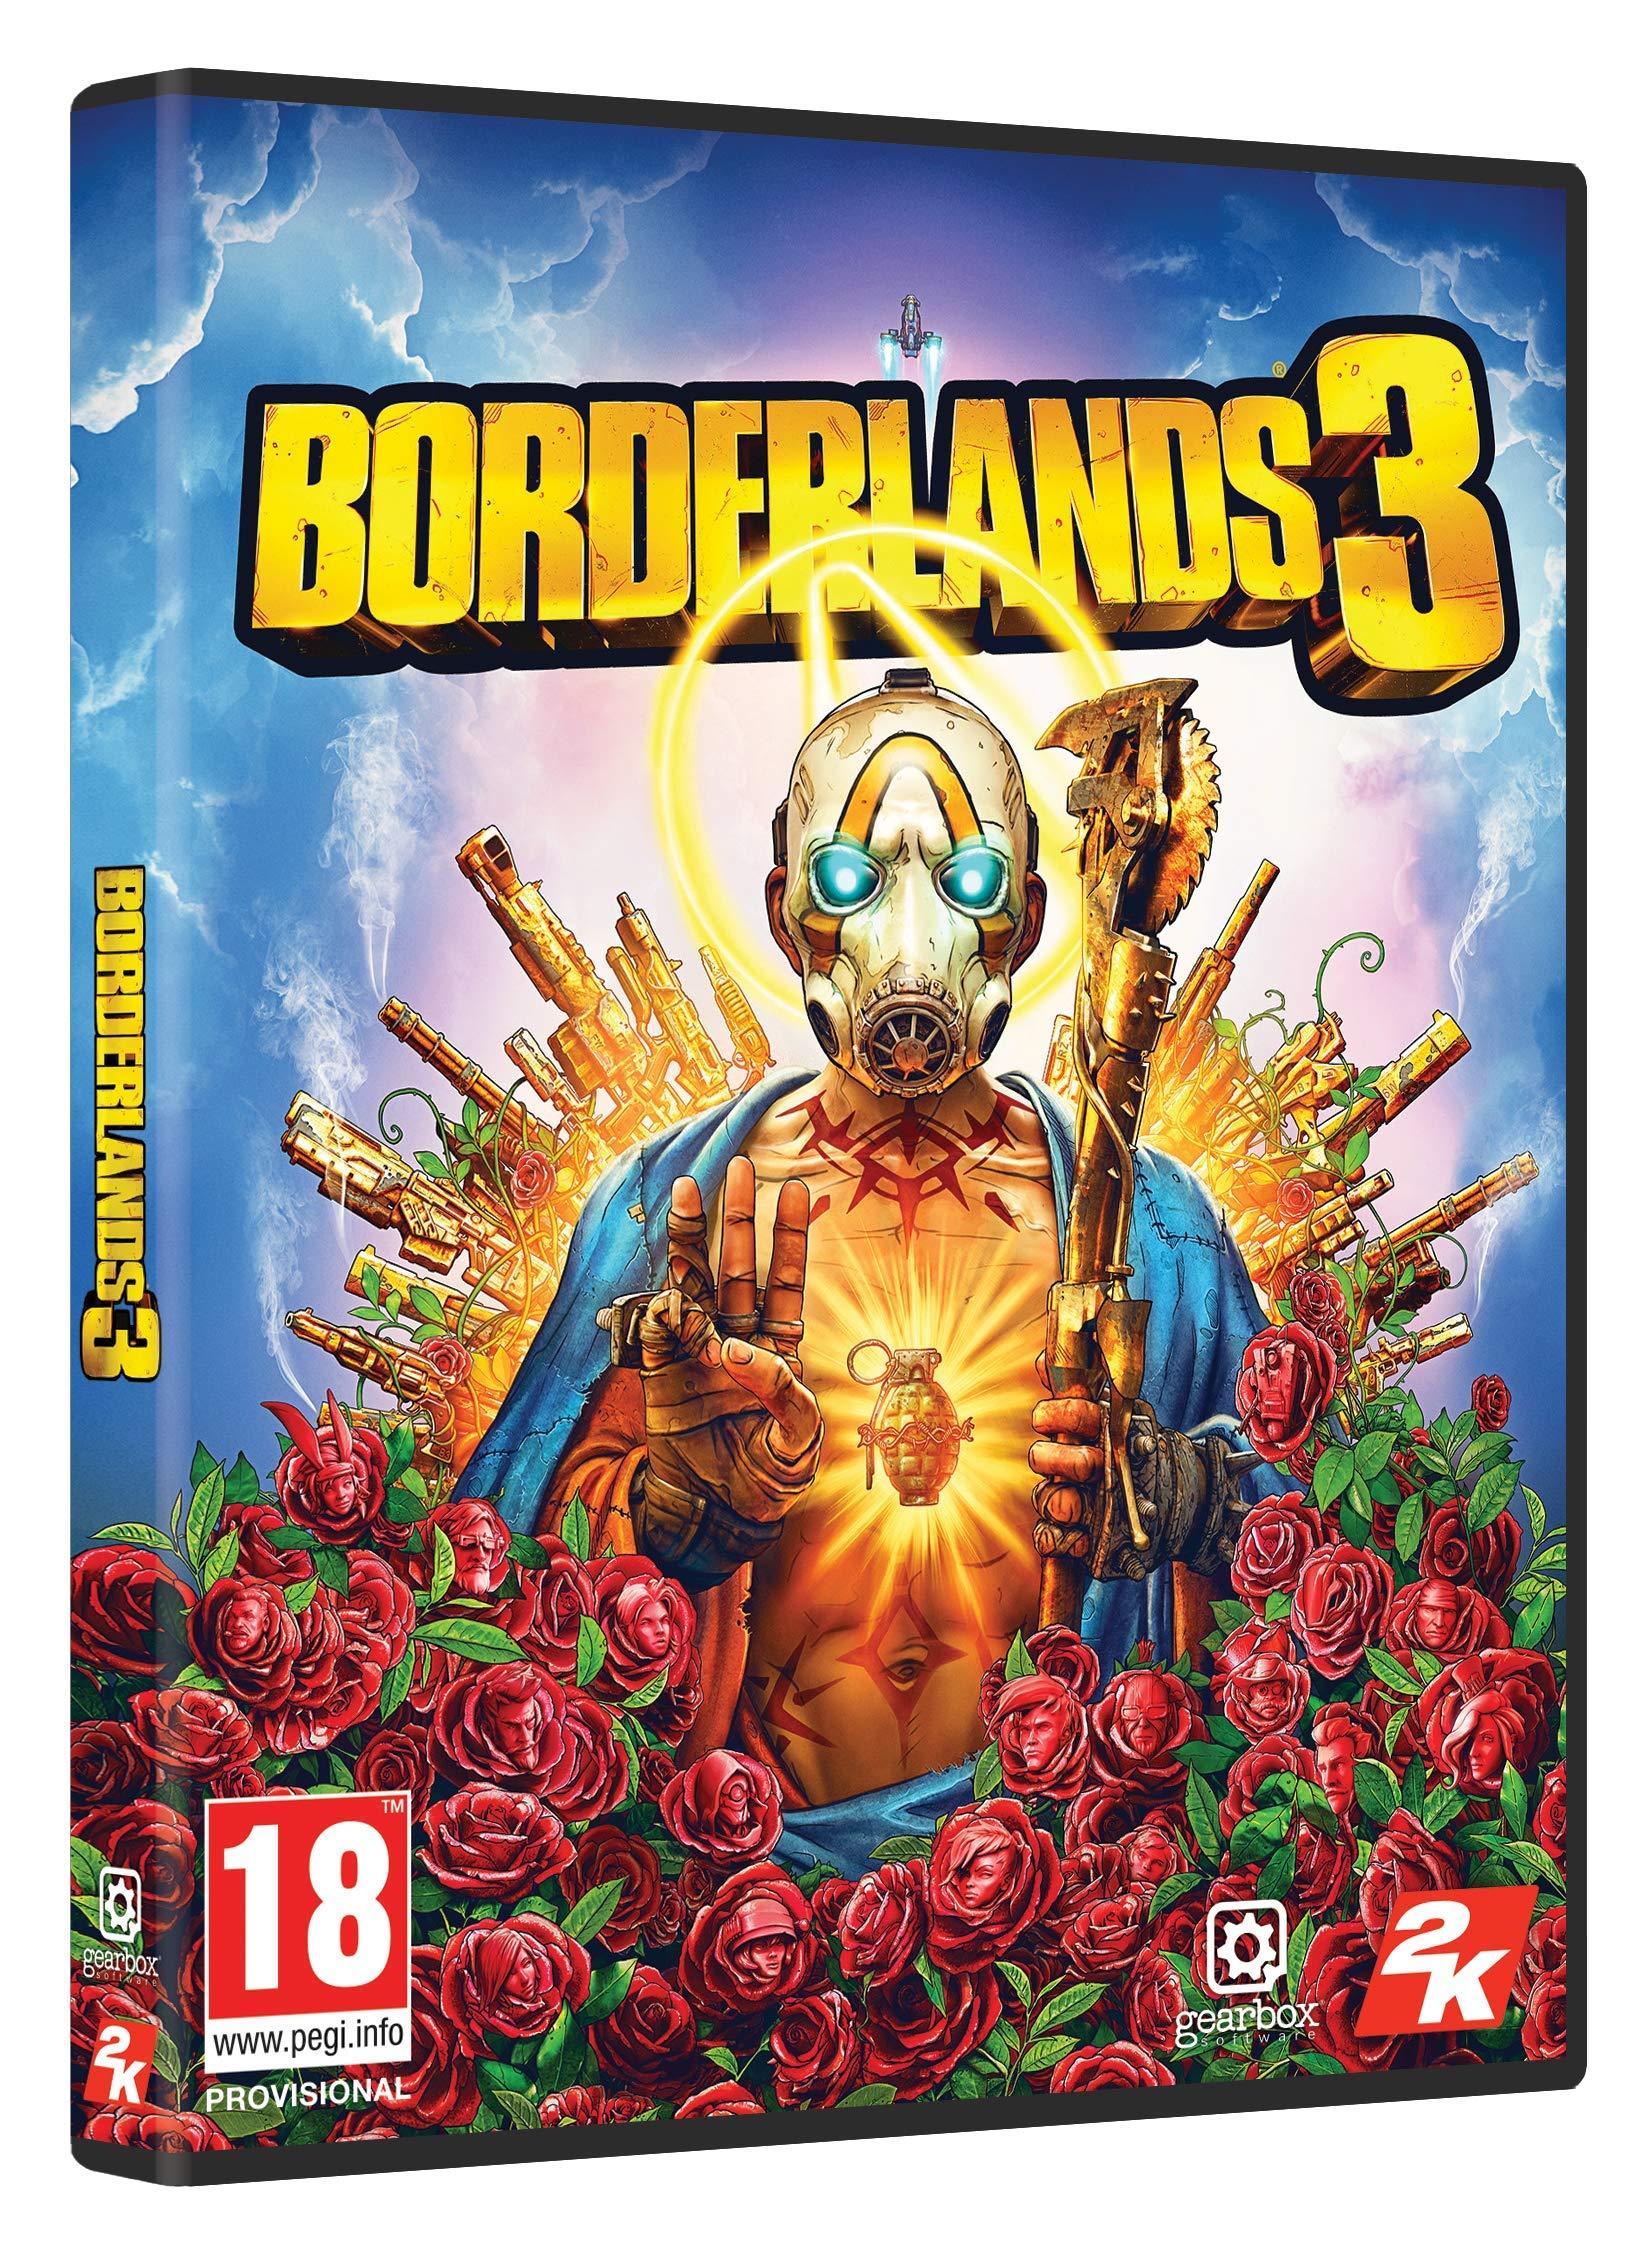 Borderlands 3 – Videojuego